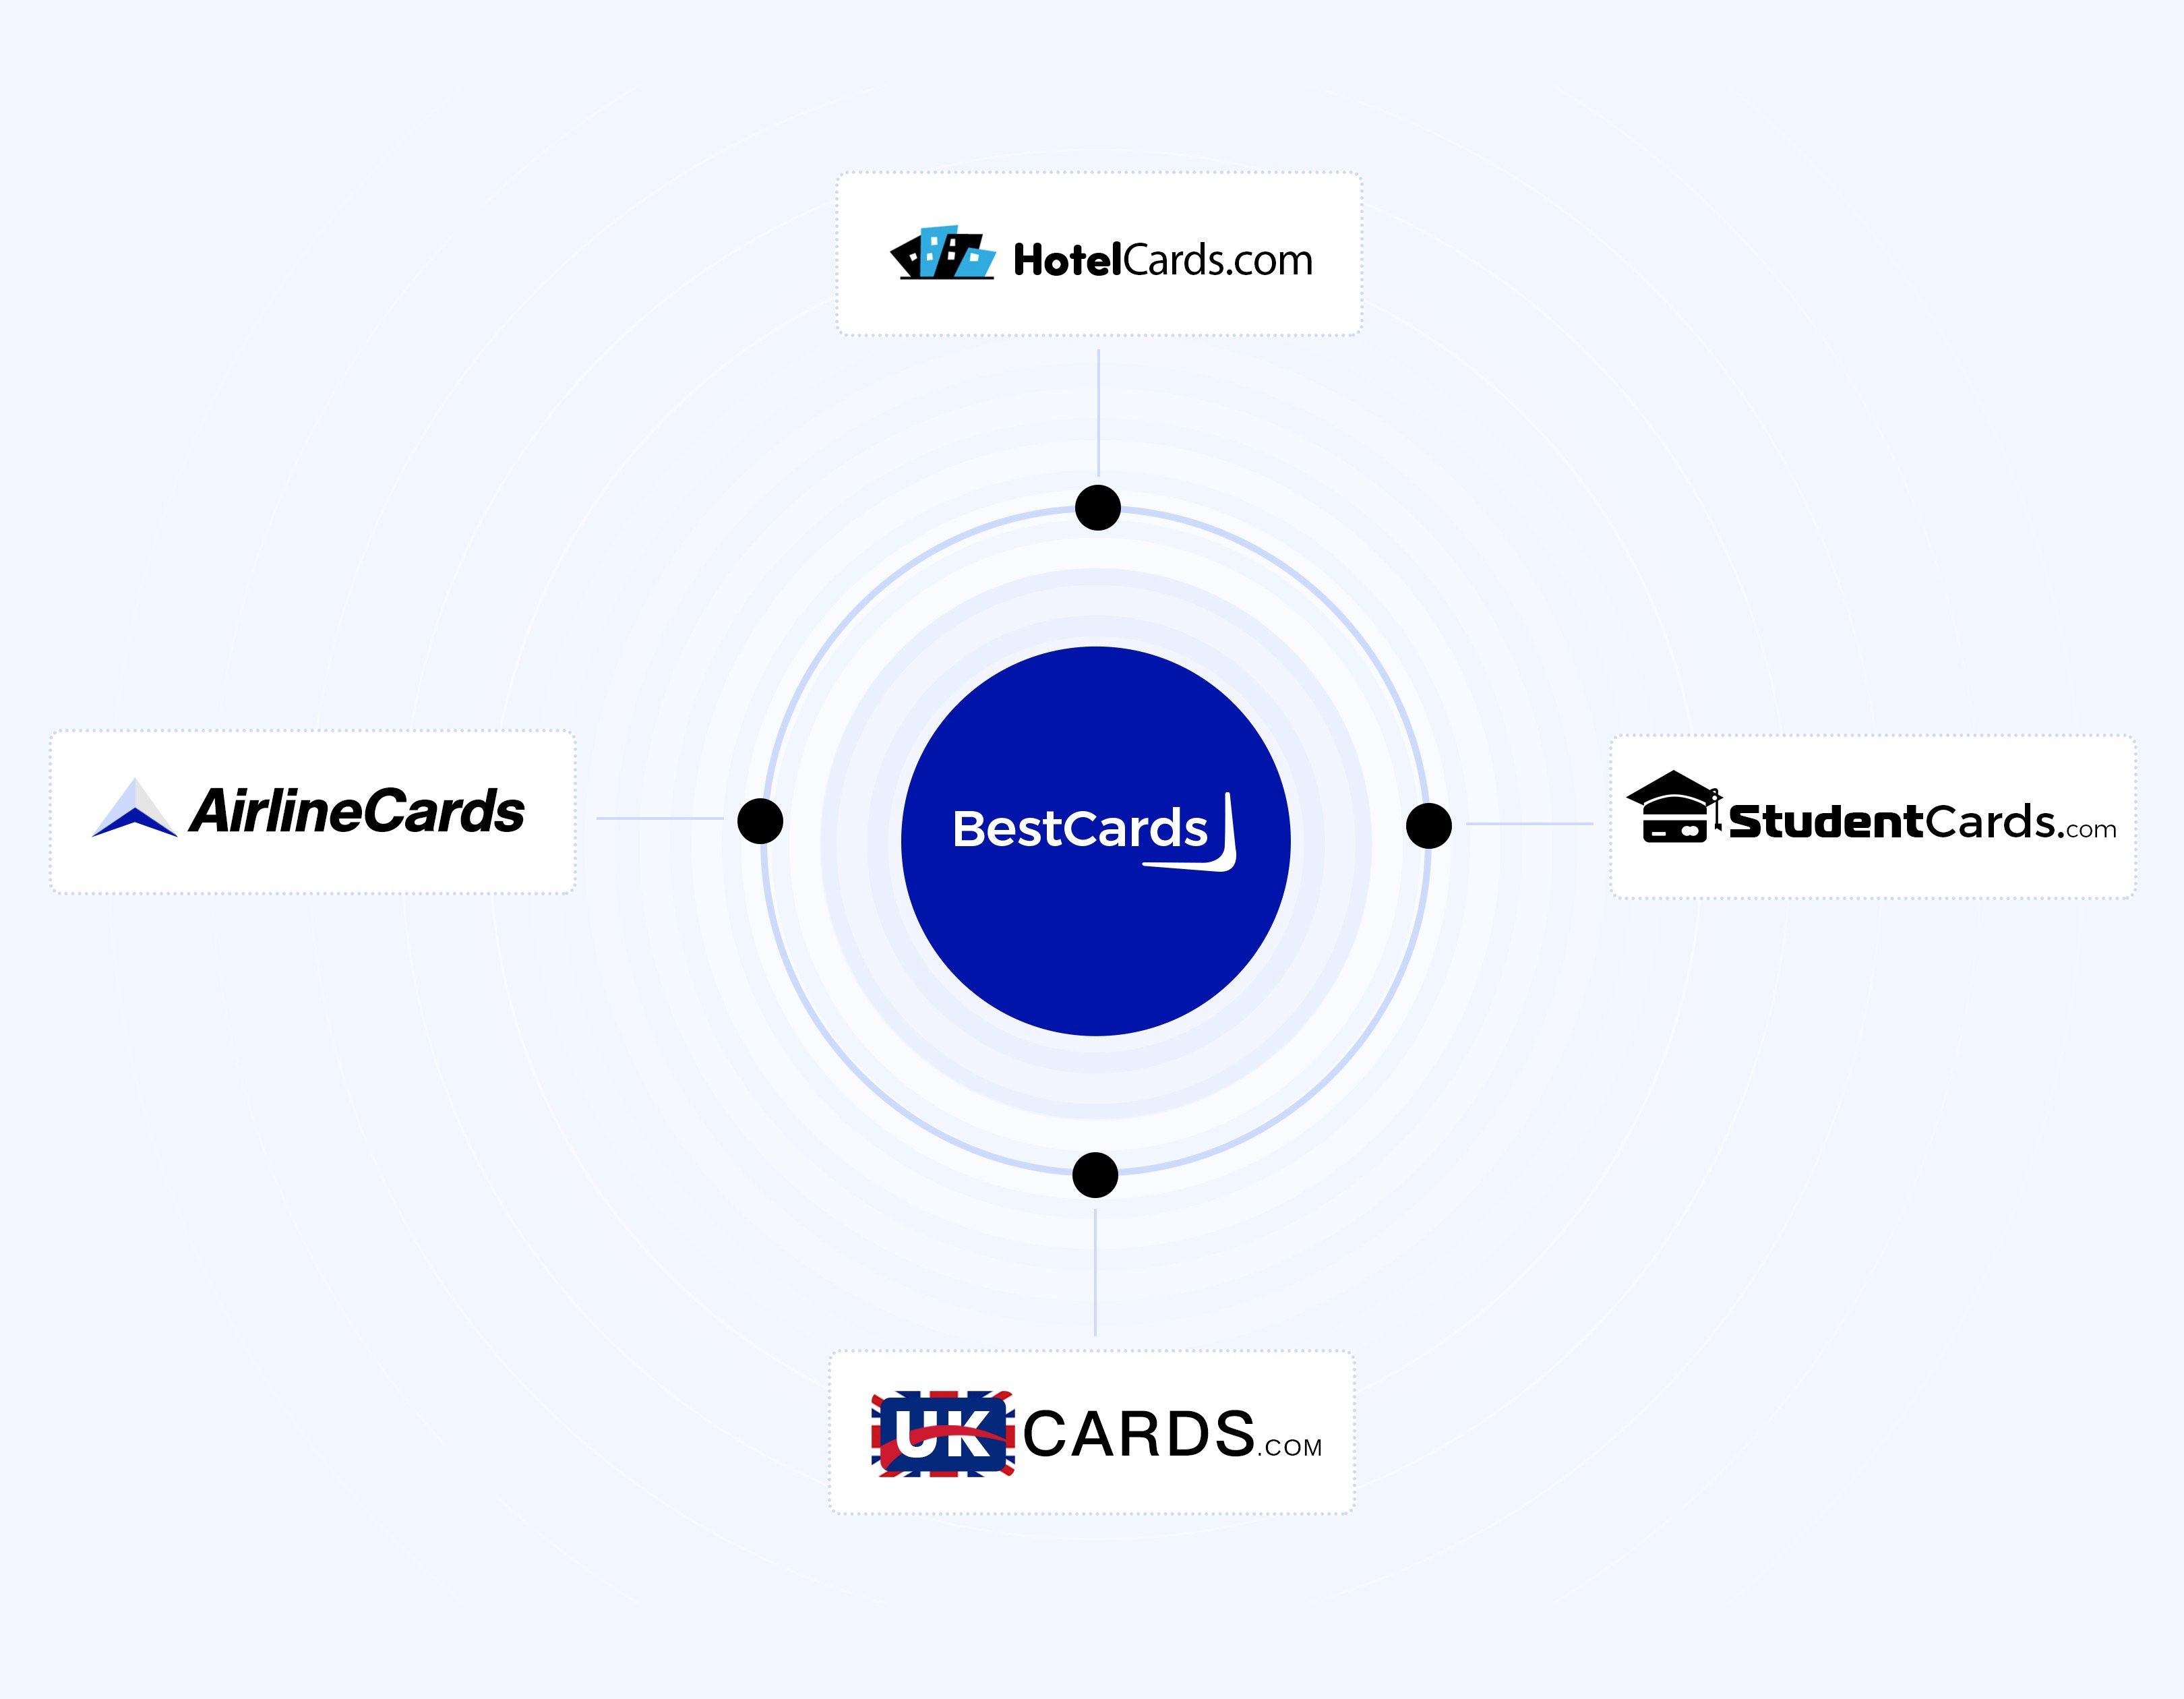 creditcard_landing_page